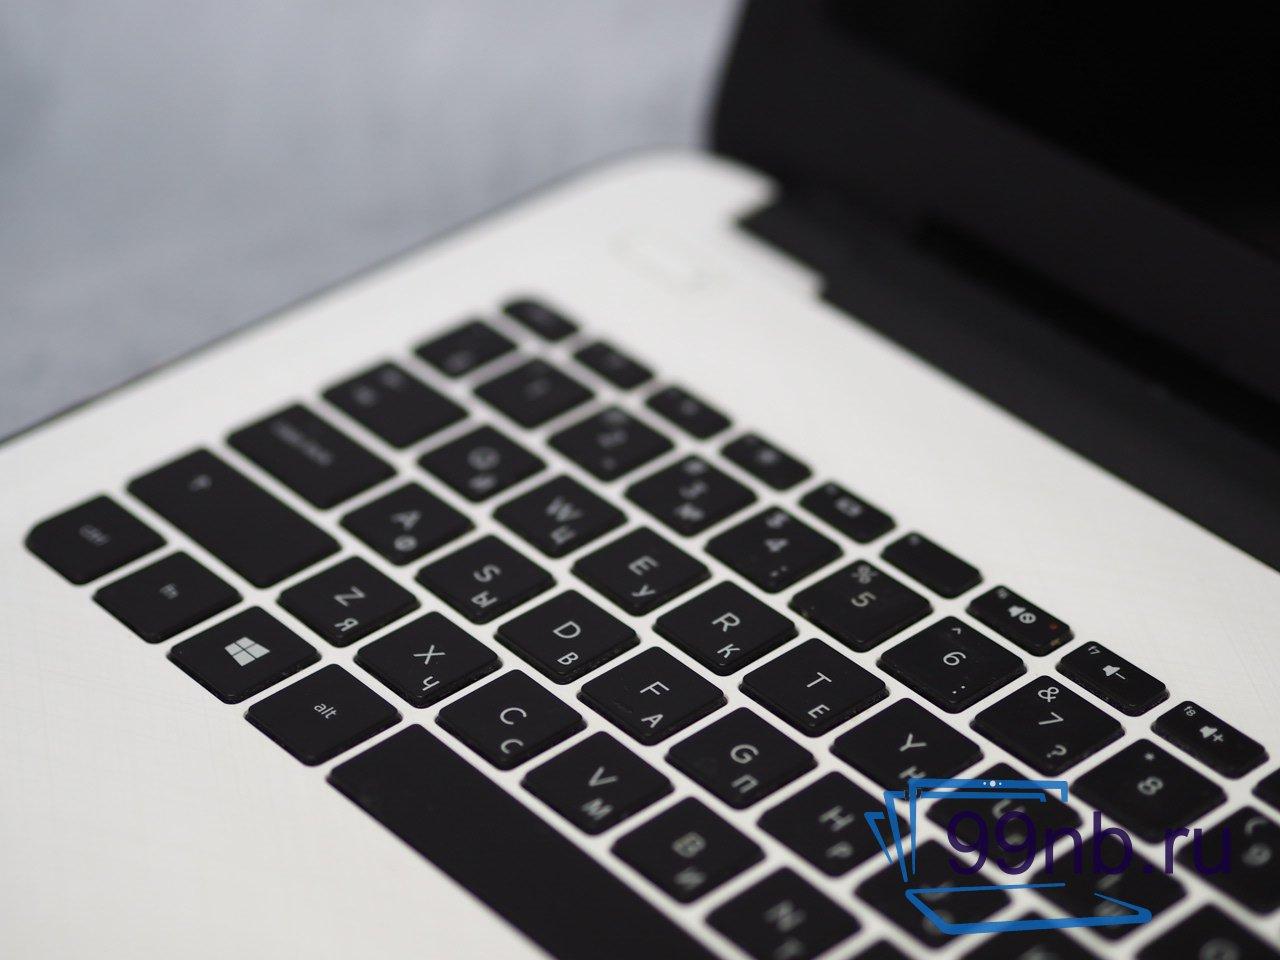 Ноутбук киномана